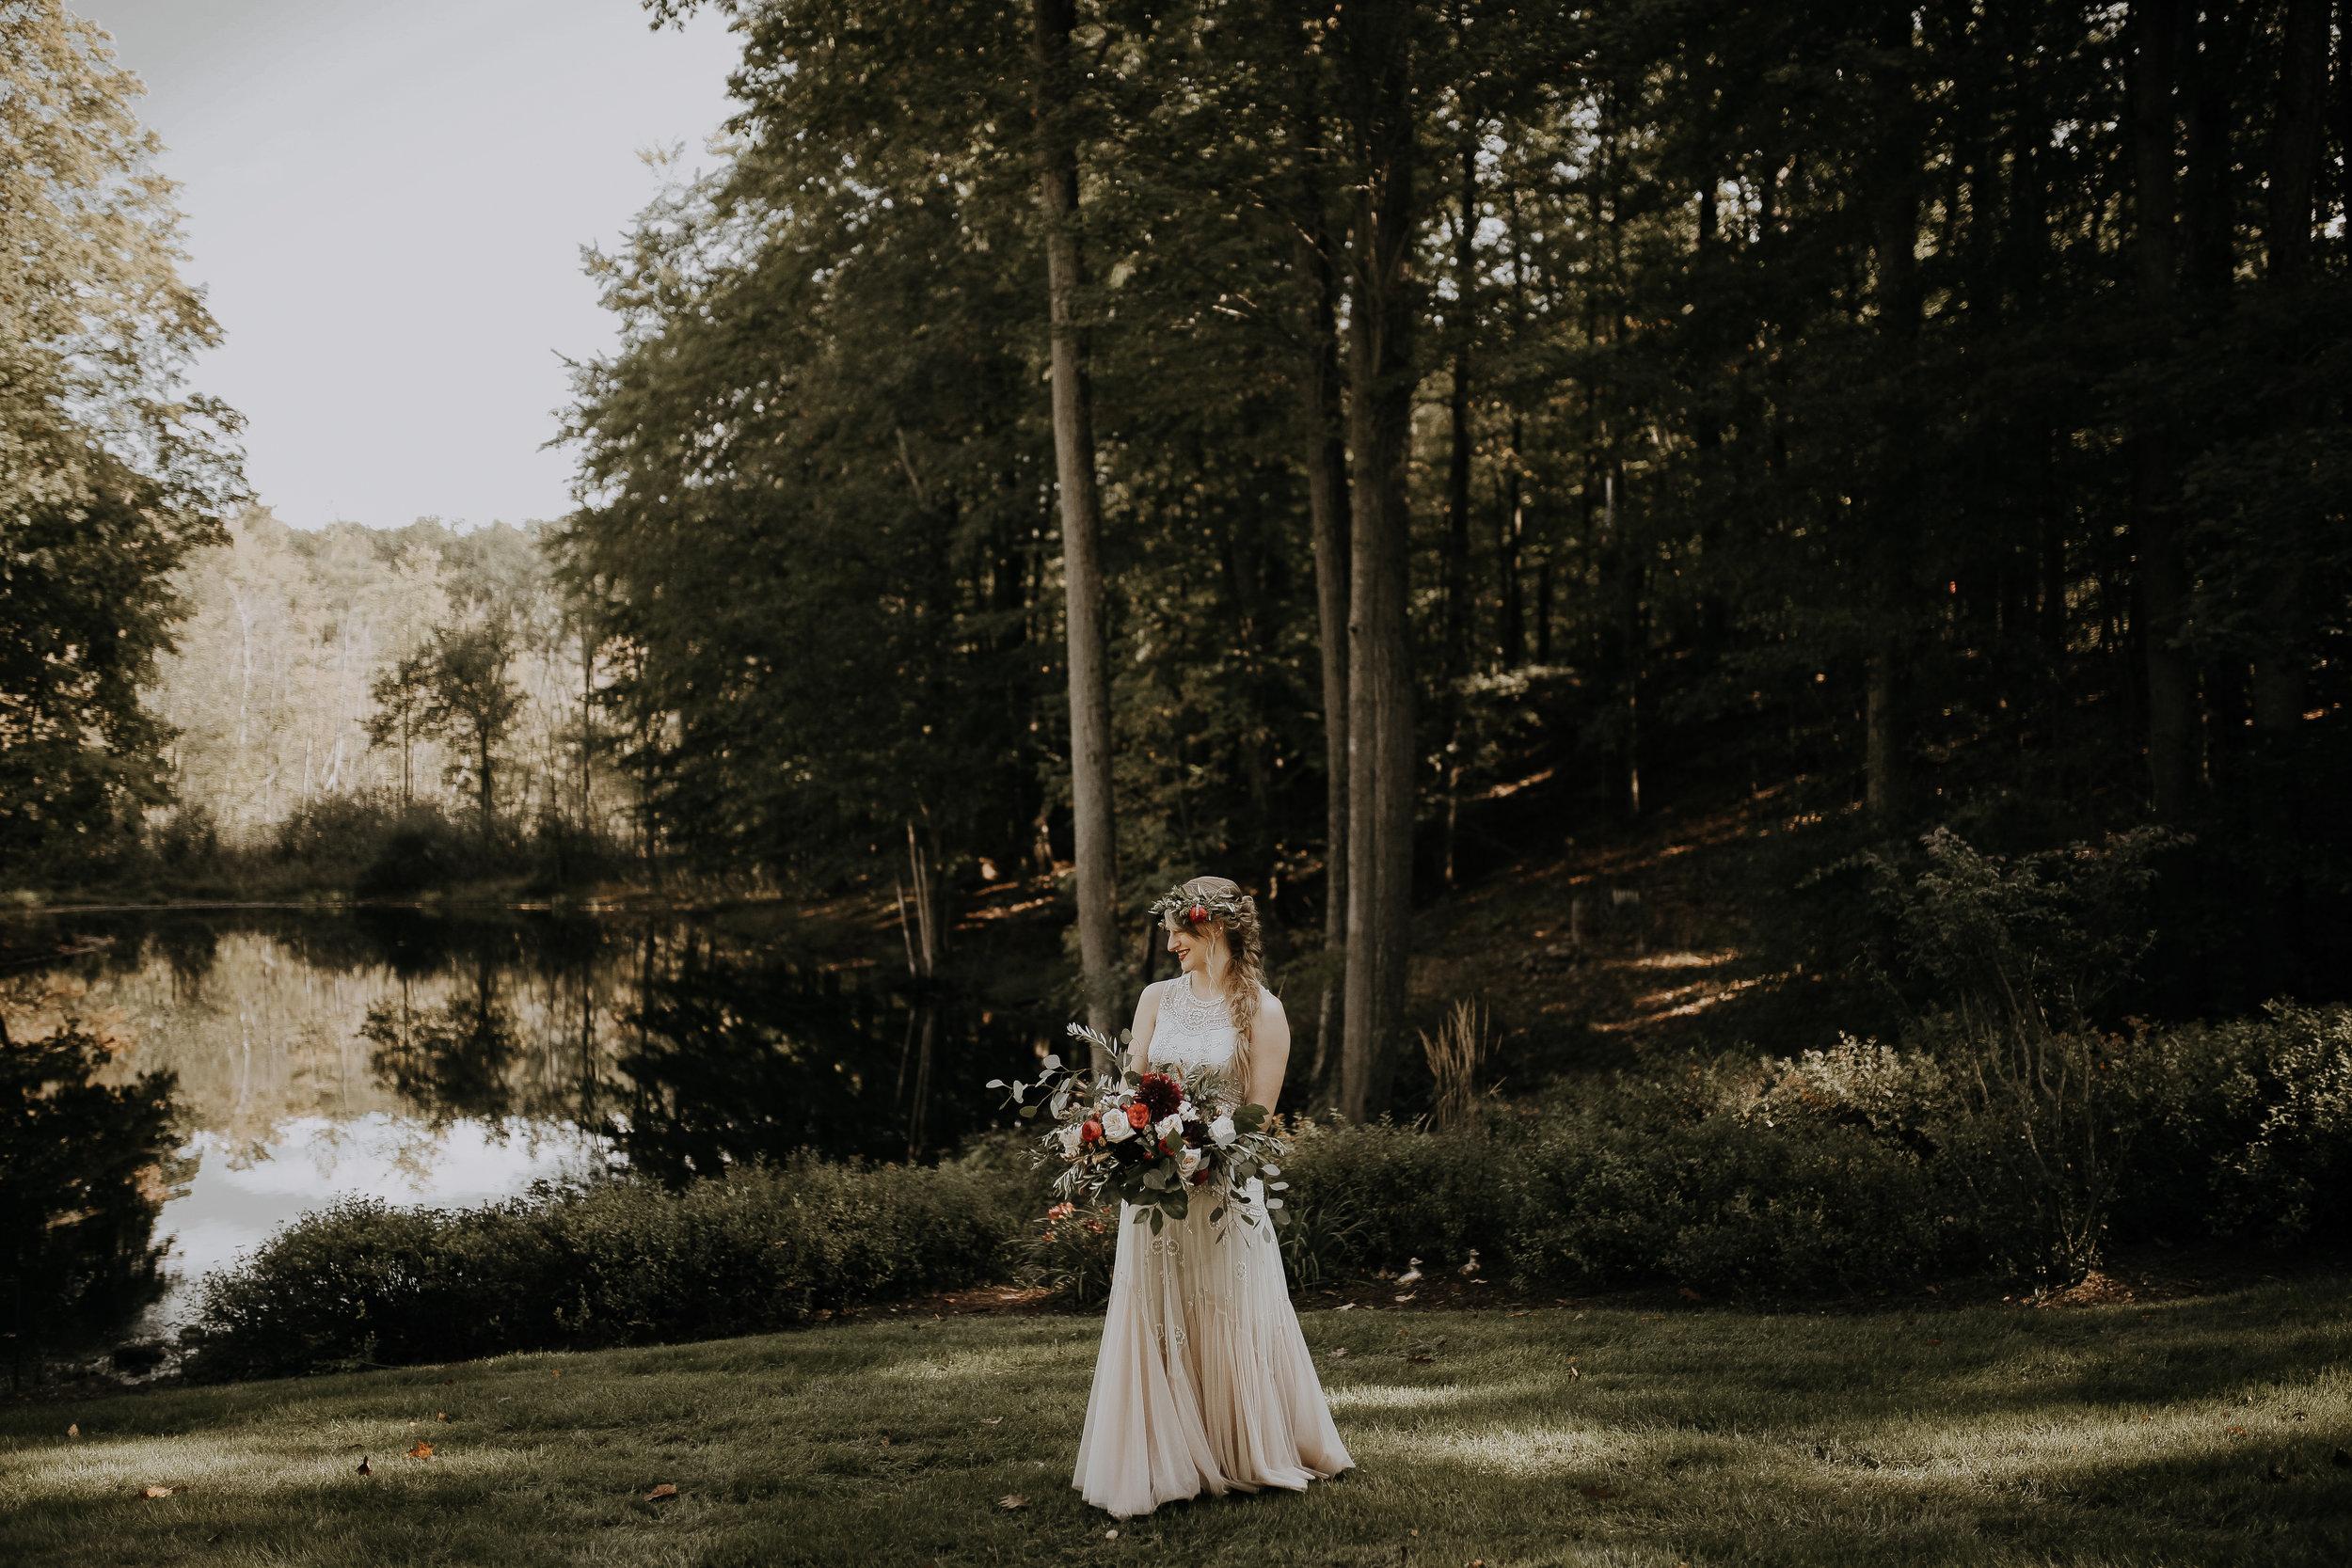 Rachael+Tom_Wedding_252.jpg